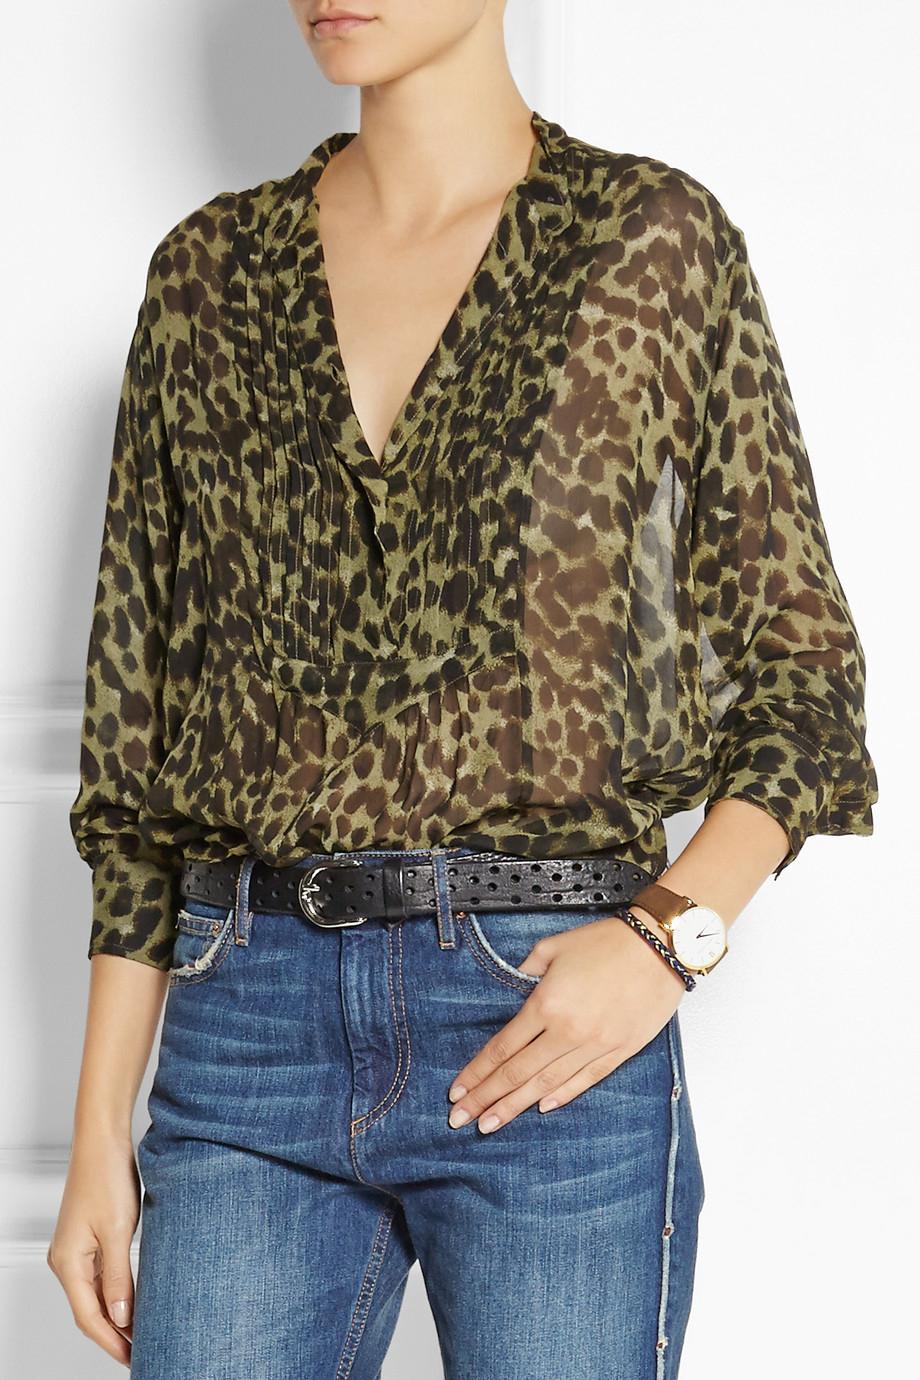 7695d6cd08b5 Étoile Isabel Marant Charley Leopard-Print Chiffon Blouse in Green - Lyst